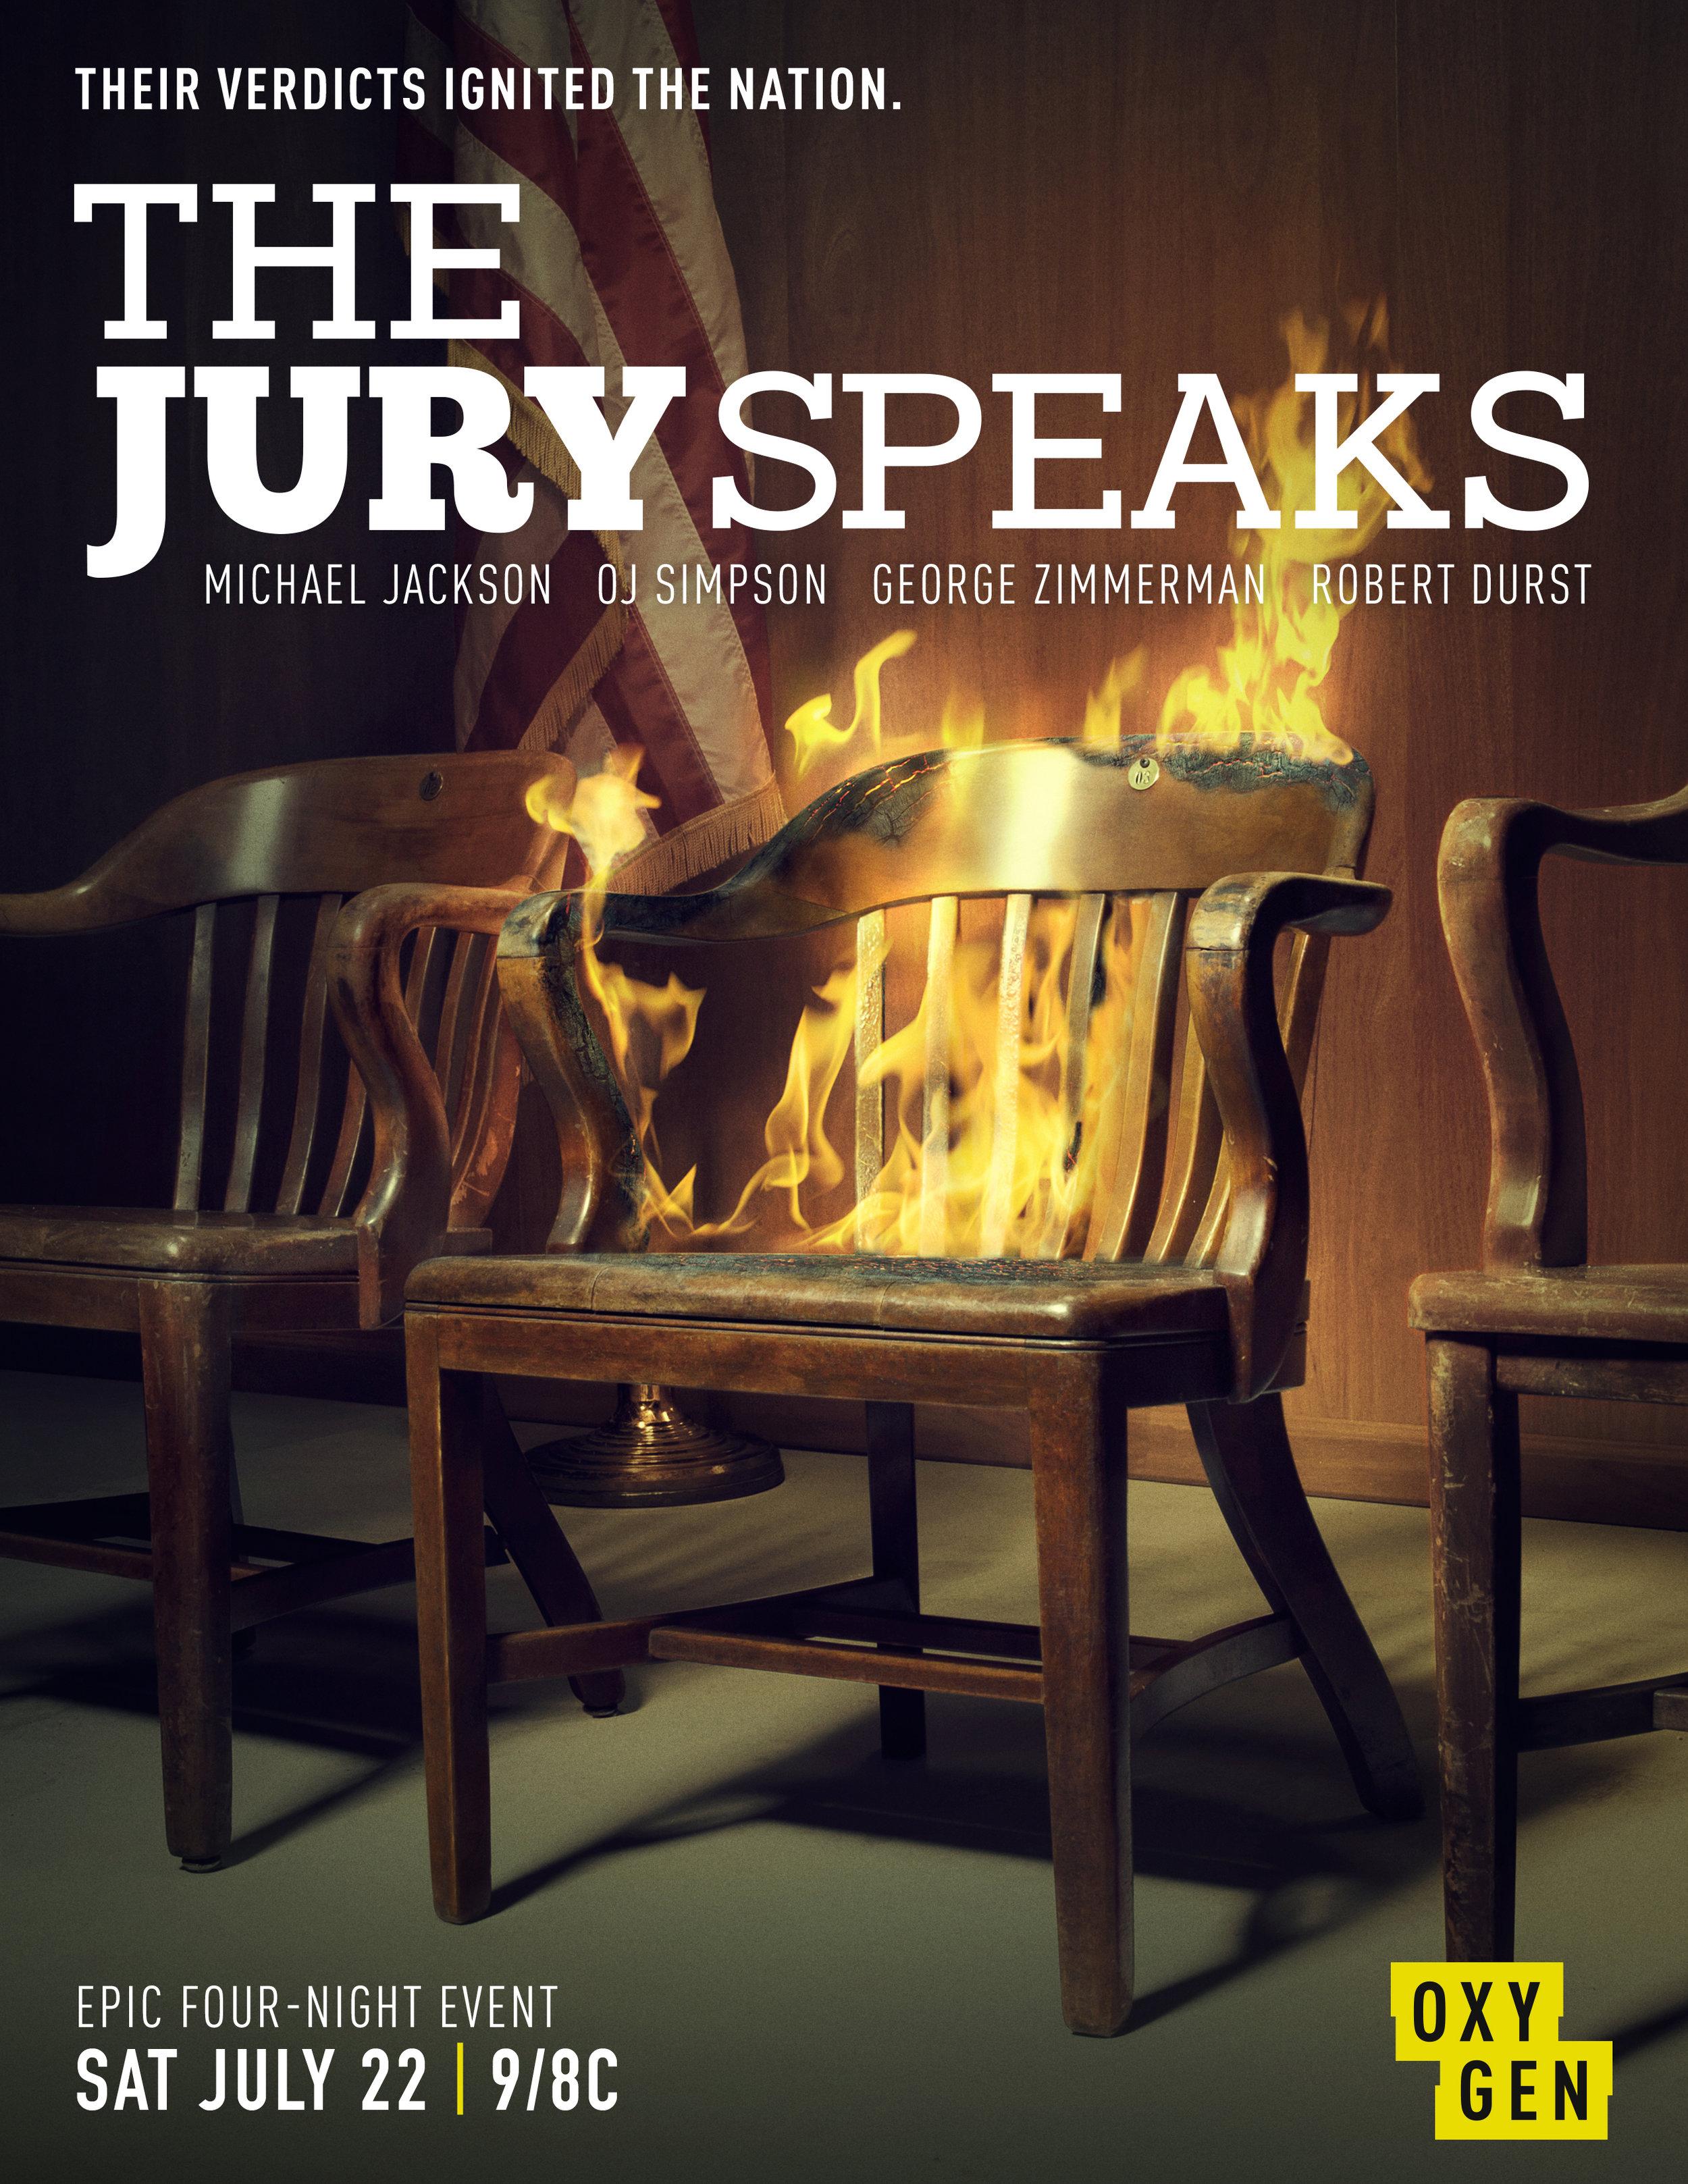 TheJurySpeaks_KeyArt_8-5x11_300dpi.jpg